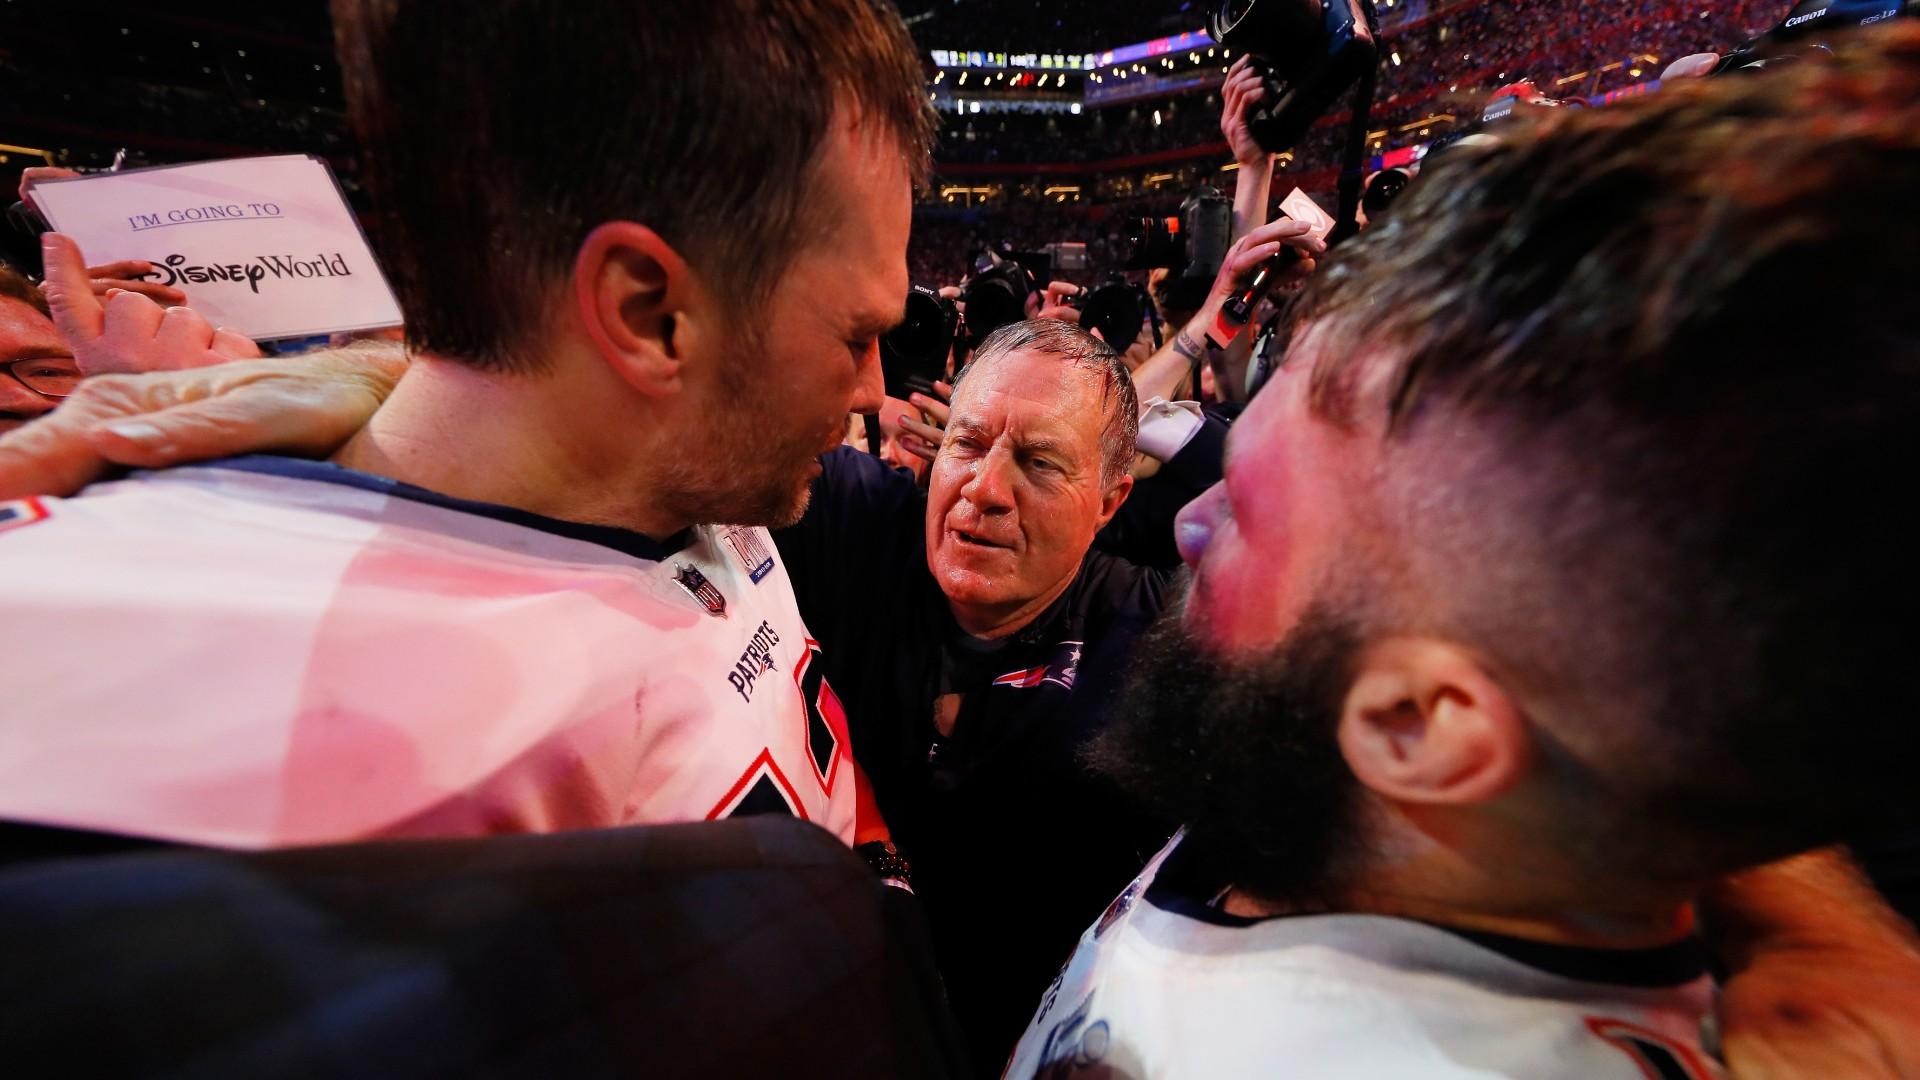 Bill Belichick and Tom Brady have reunited – to praise Julian Edelman's career